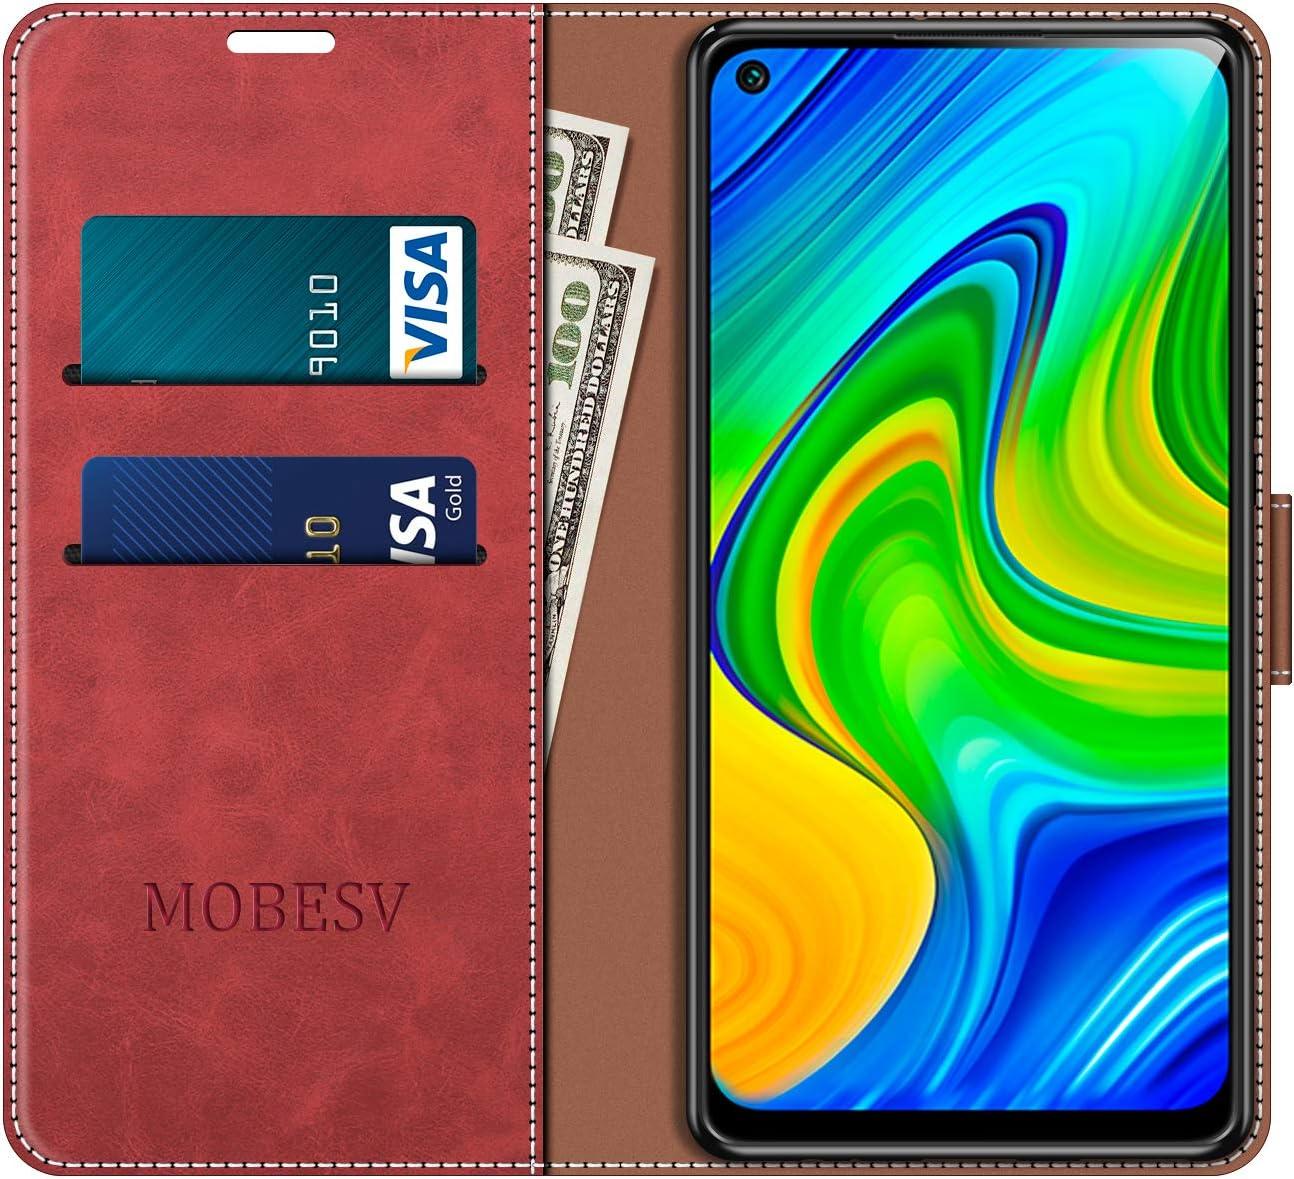 MOBESV Funda para Xiaomi Redmi Note 9 Funda Libro Xiaomi Redmi Note 9 Rojo Funda M/óvil Xiaomi Redmi Note 9 Magn/ético Carcasa para Xiaomi Redmi Note 9 Funda con Tapa